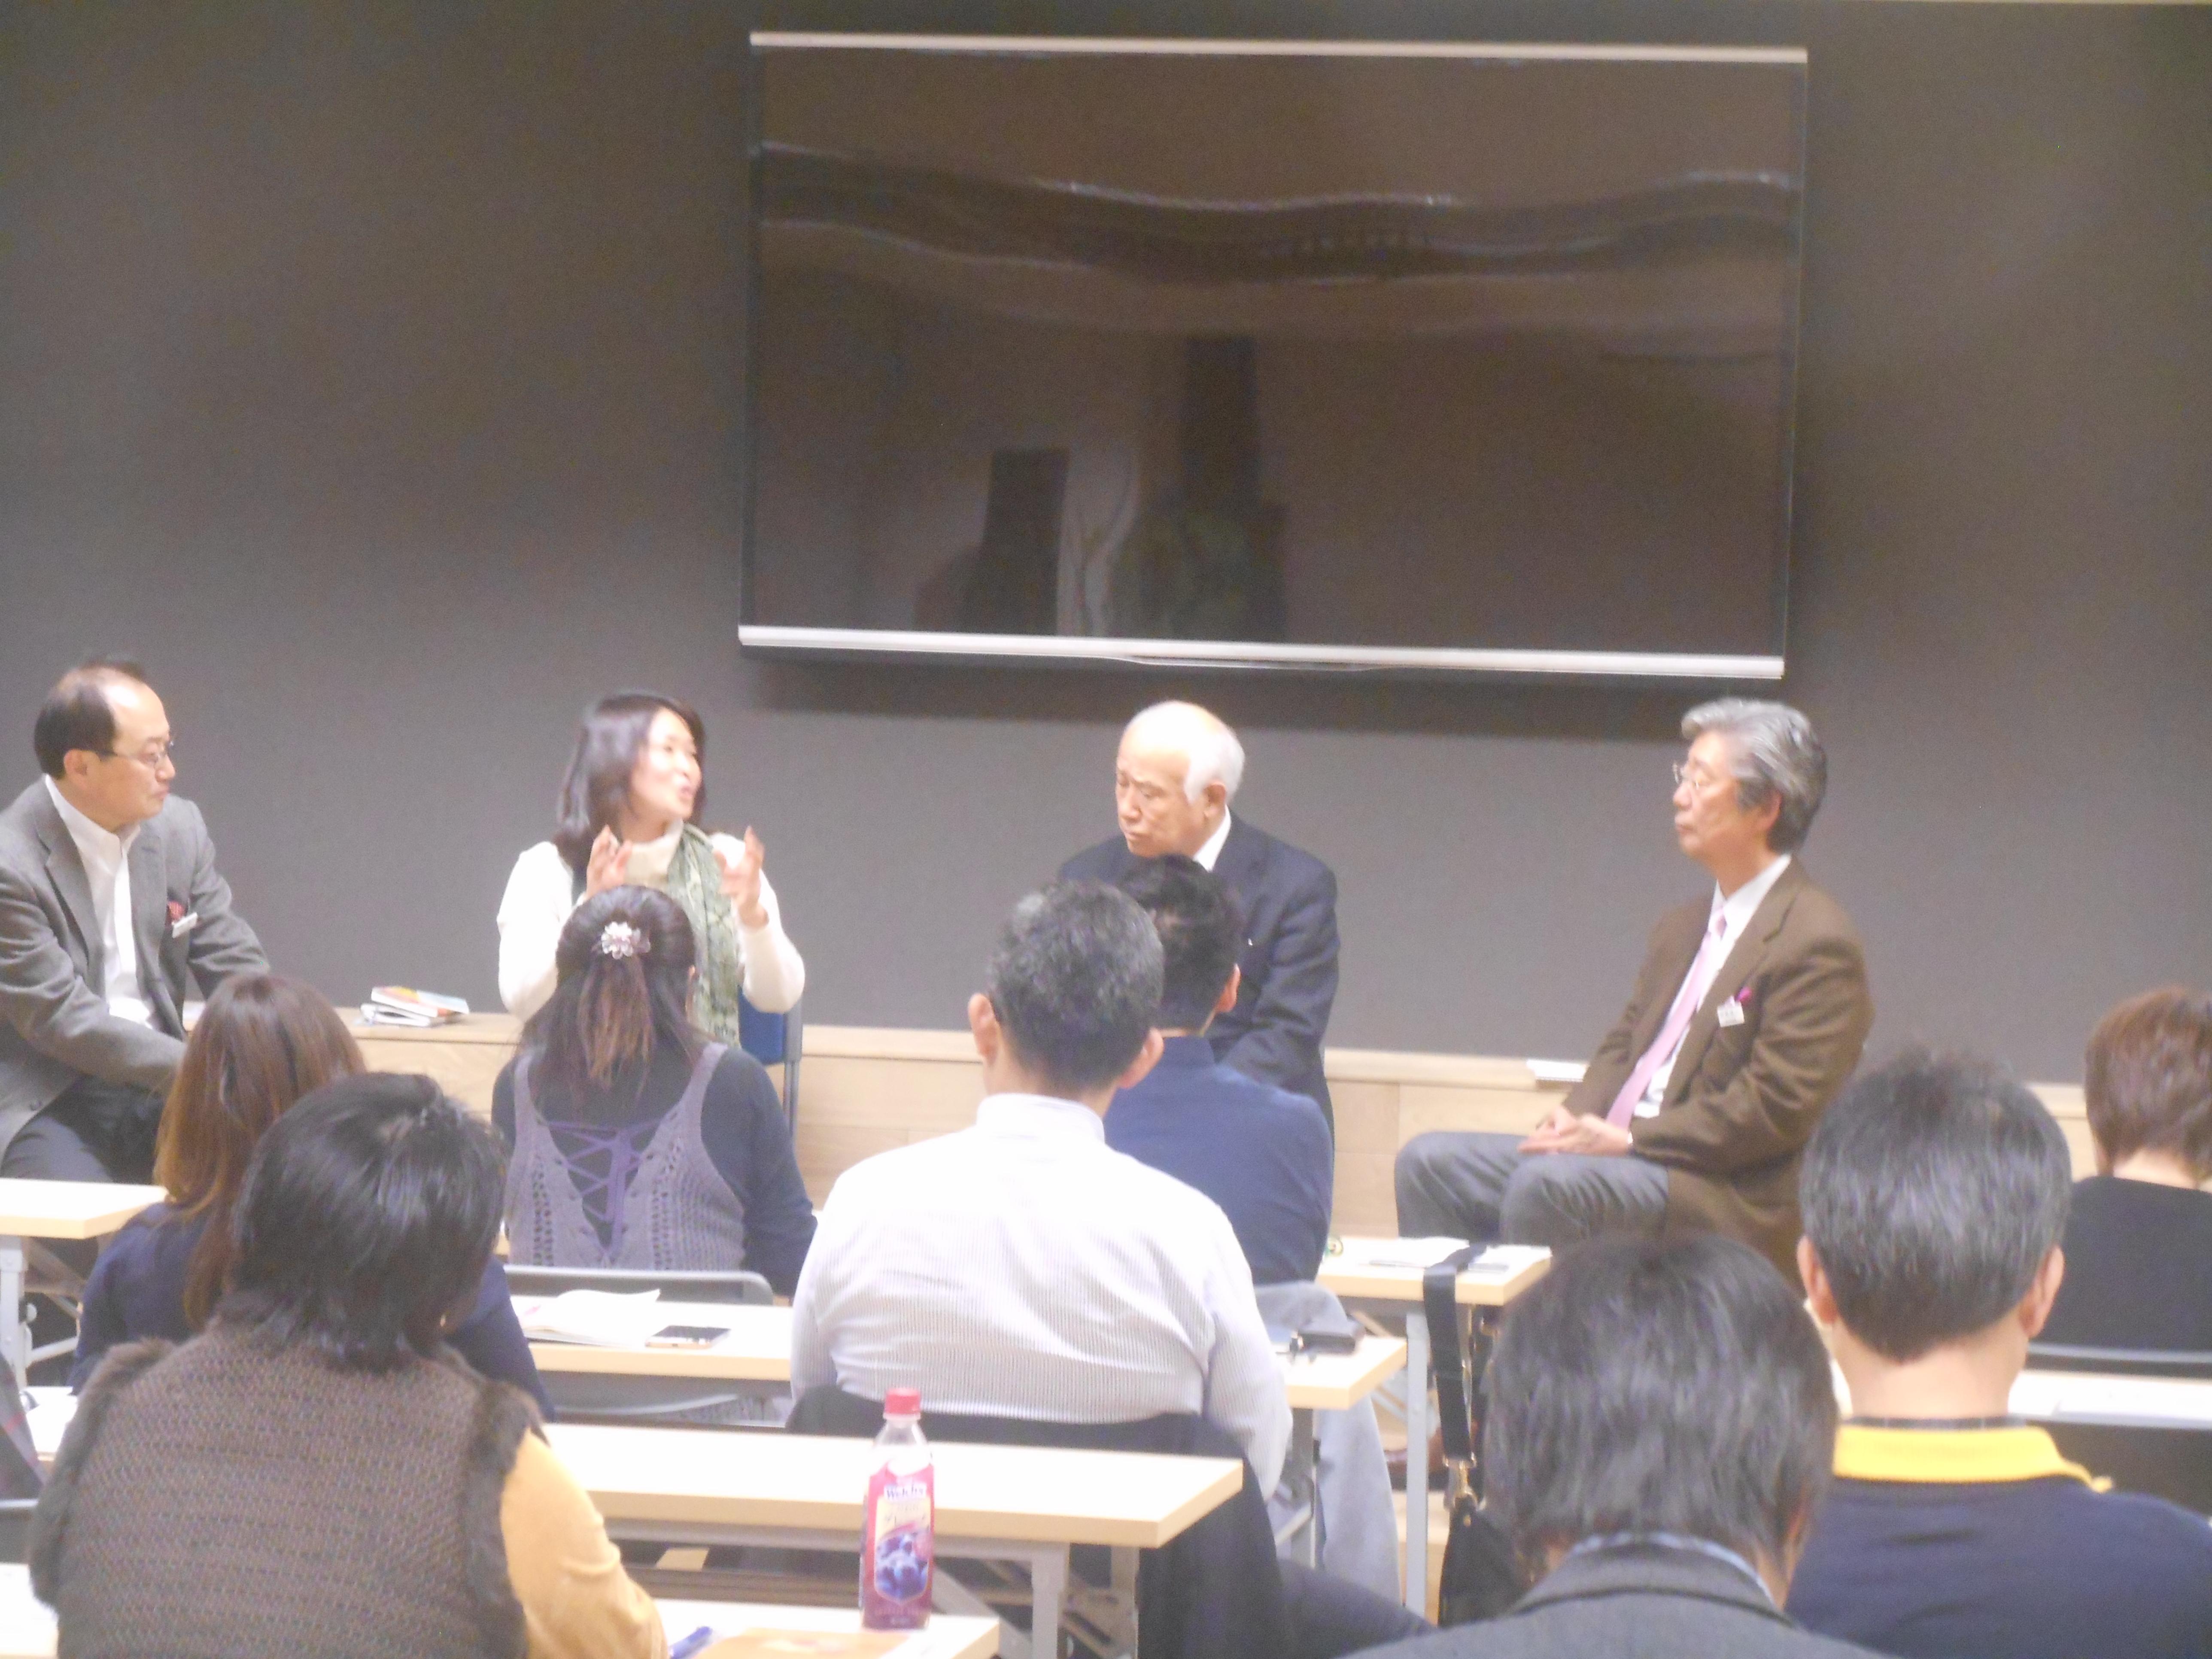 DSCN0498 - 4月1日東京思風塾の開催になります。